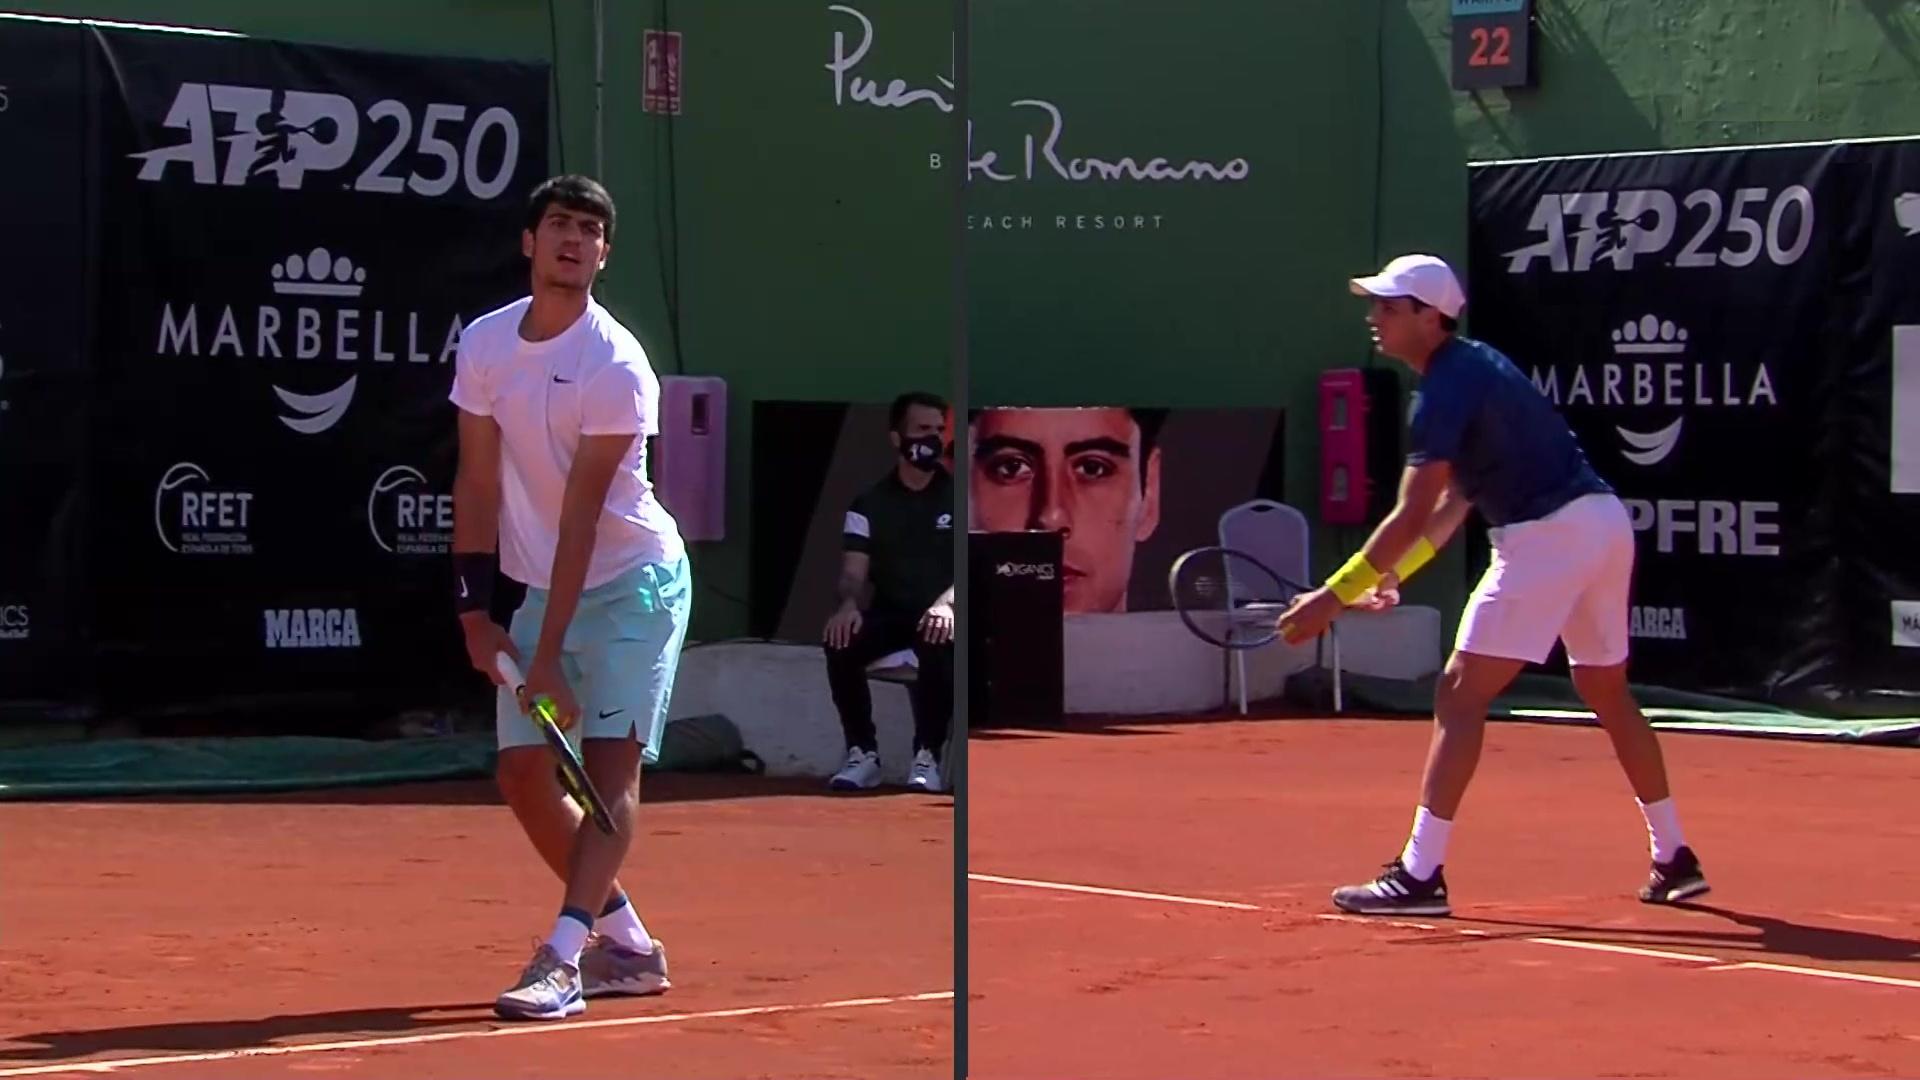 ATP 250 Torneo Marbella, 2ª semifinal: C. Alcaraz - J. Munar